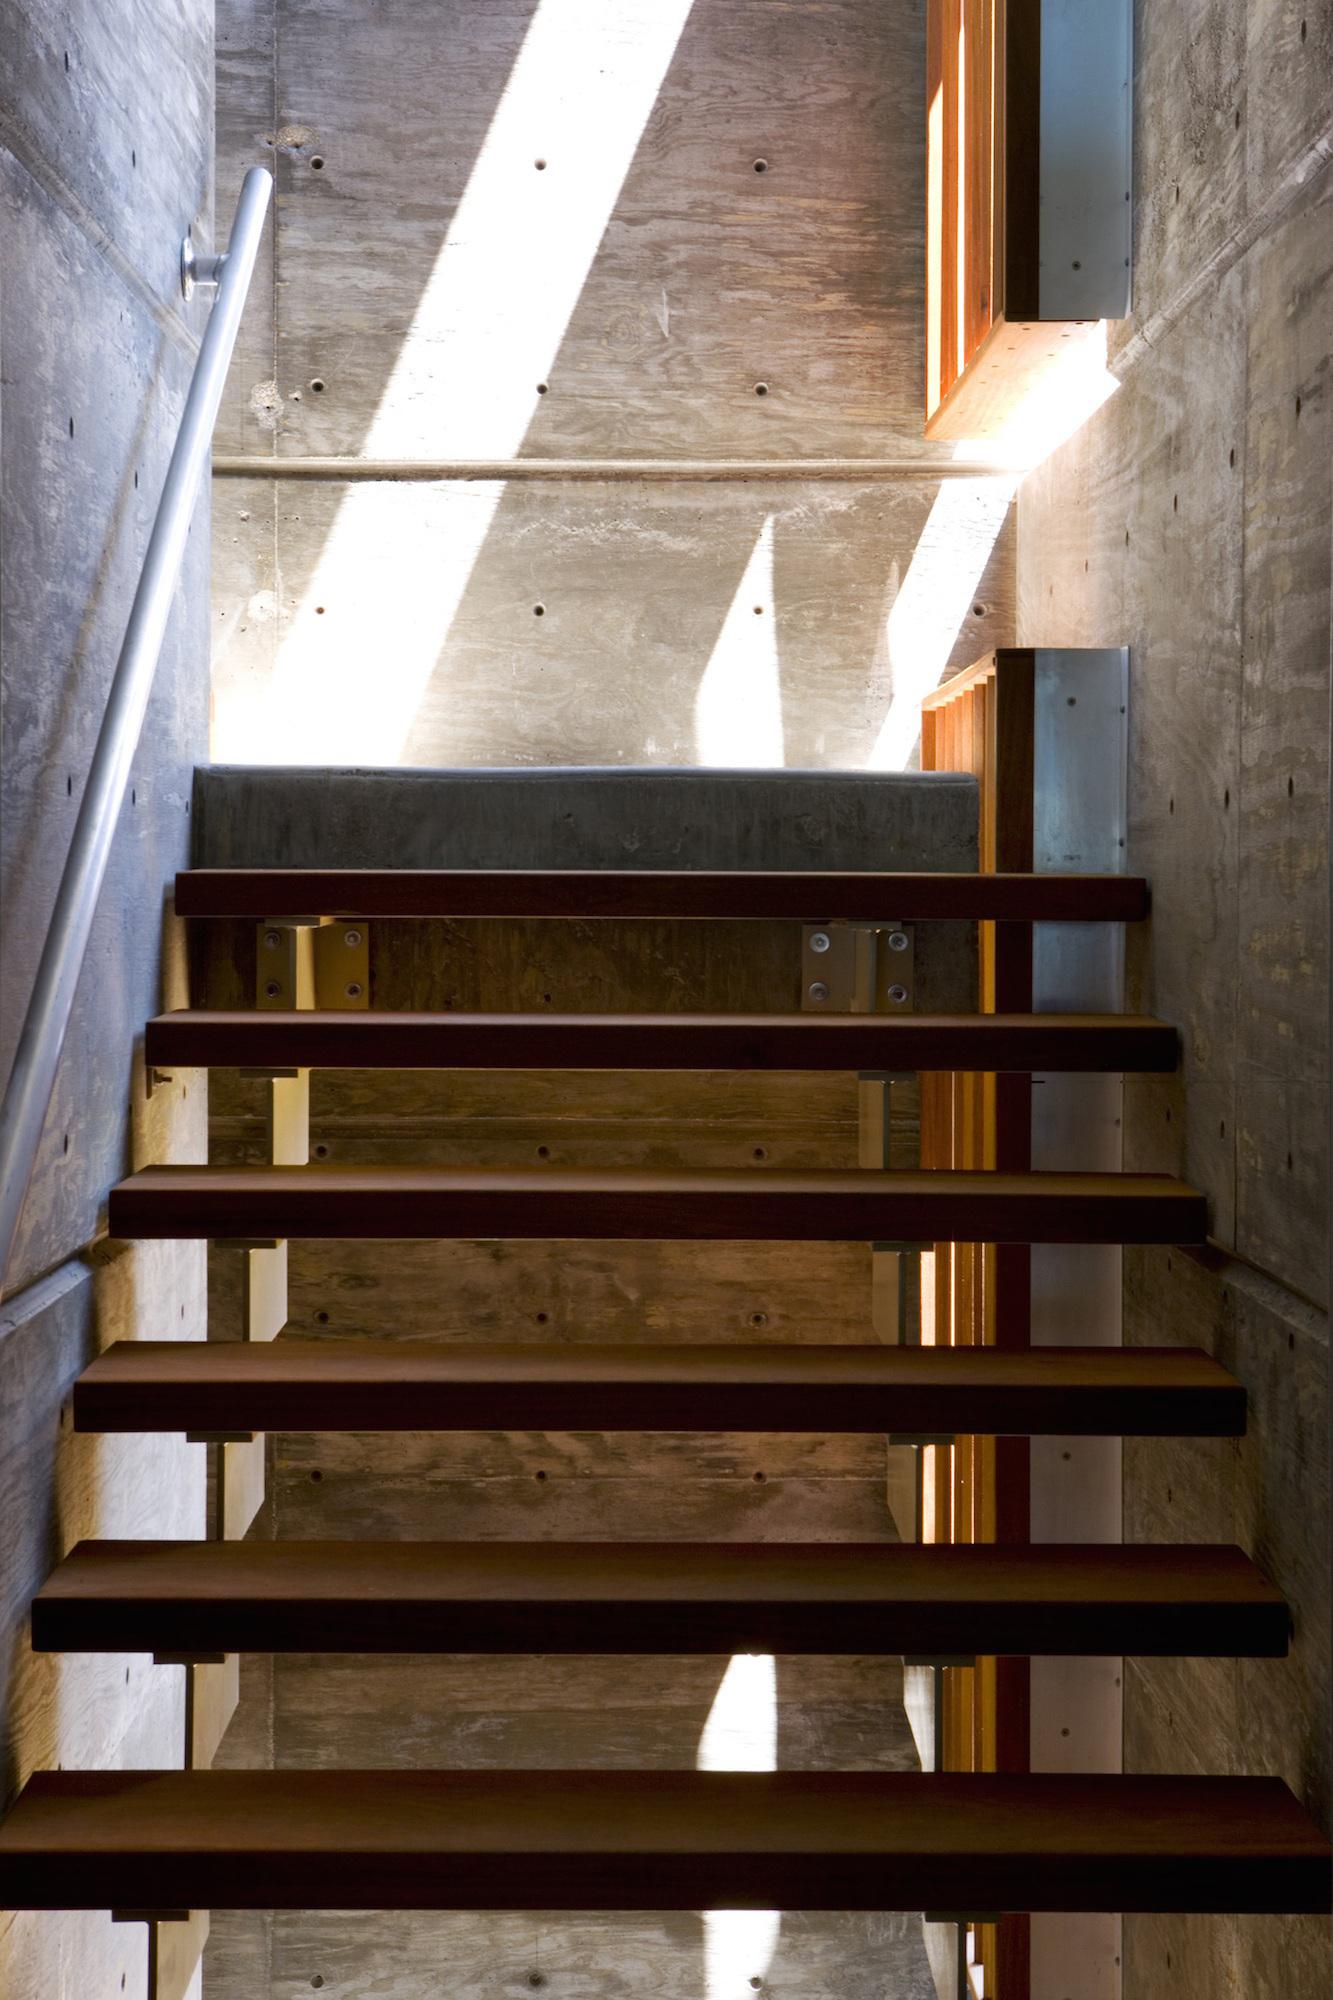 residencia-tavernier-drive-luis-pons-design-lab_eric_carle_060407_052